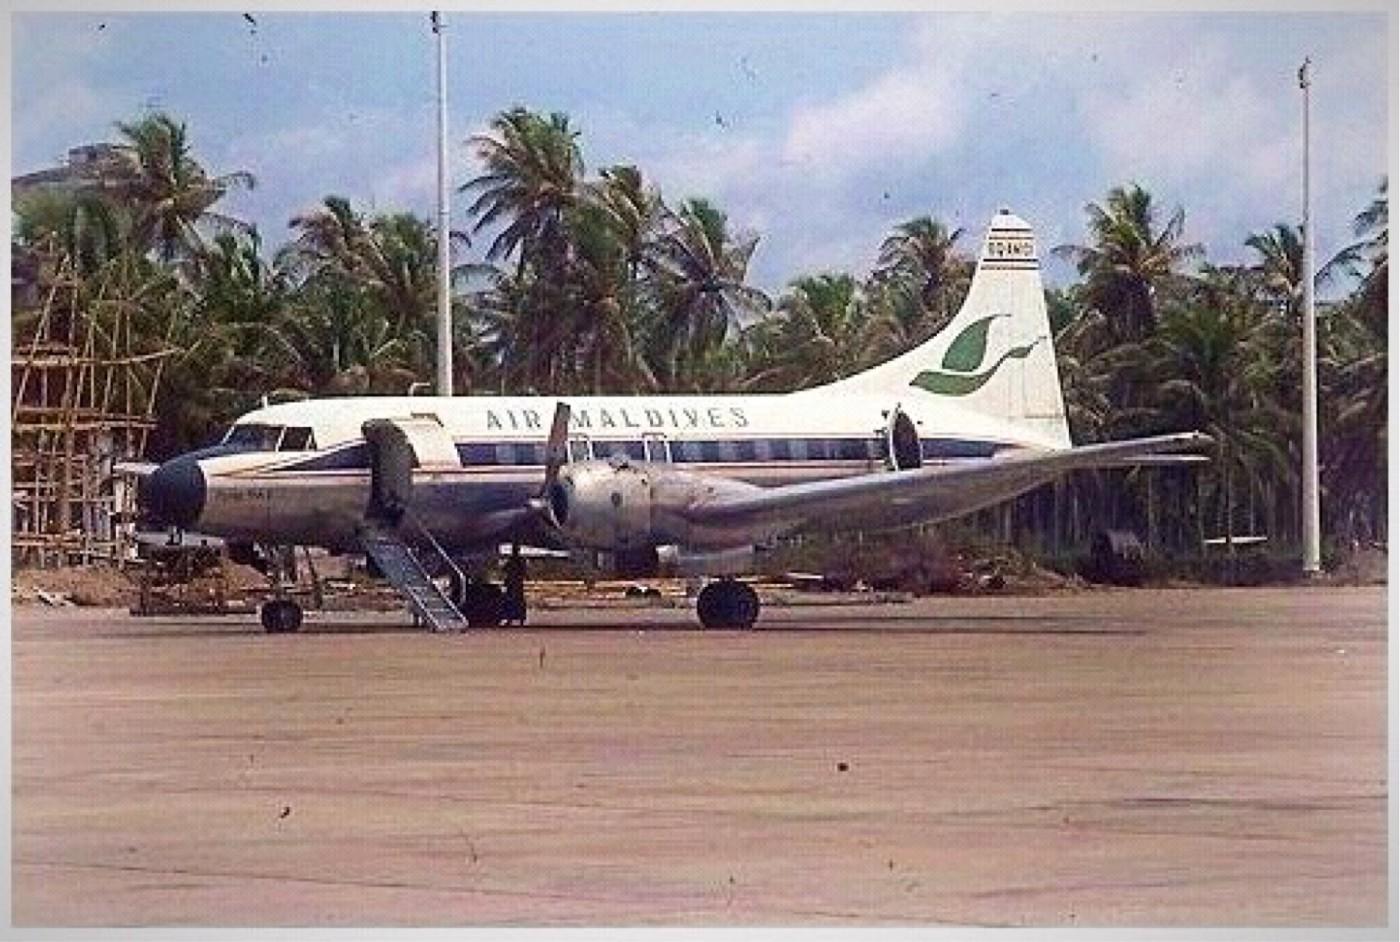 The Convair 440